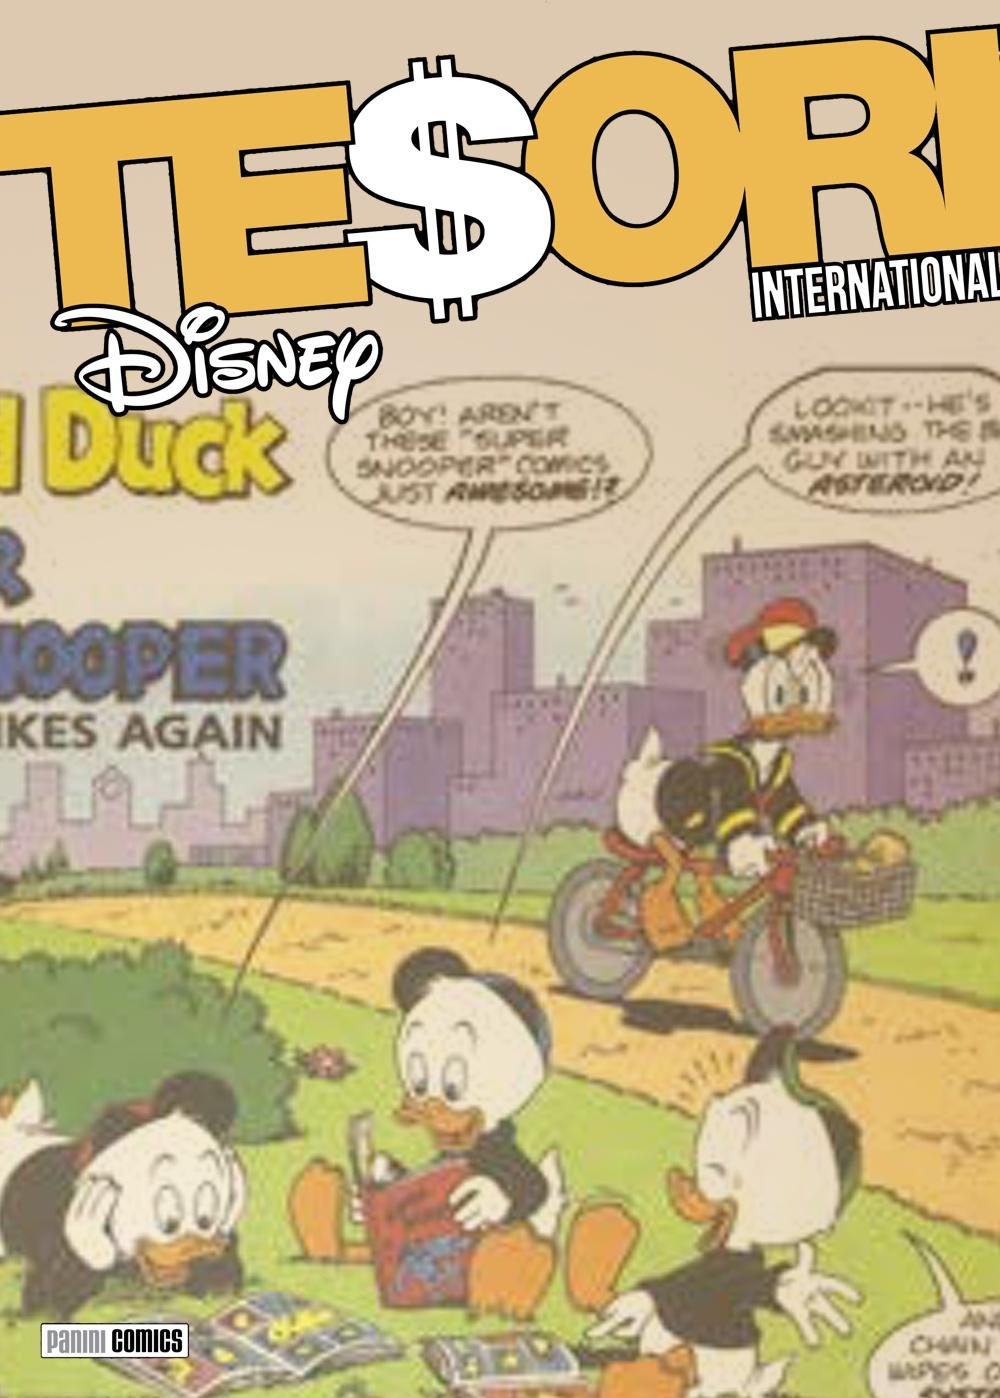 Cover Tesori International 4